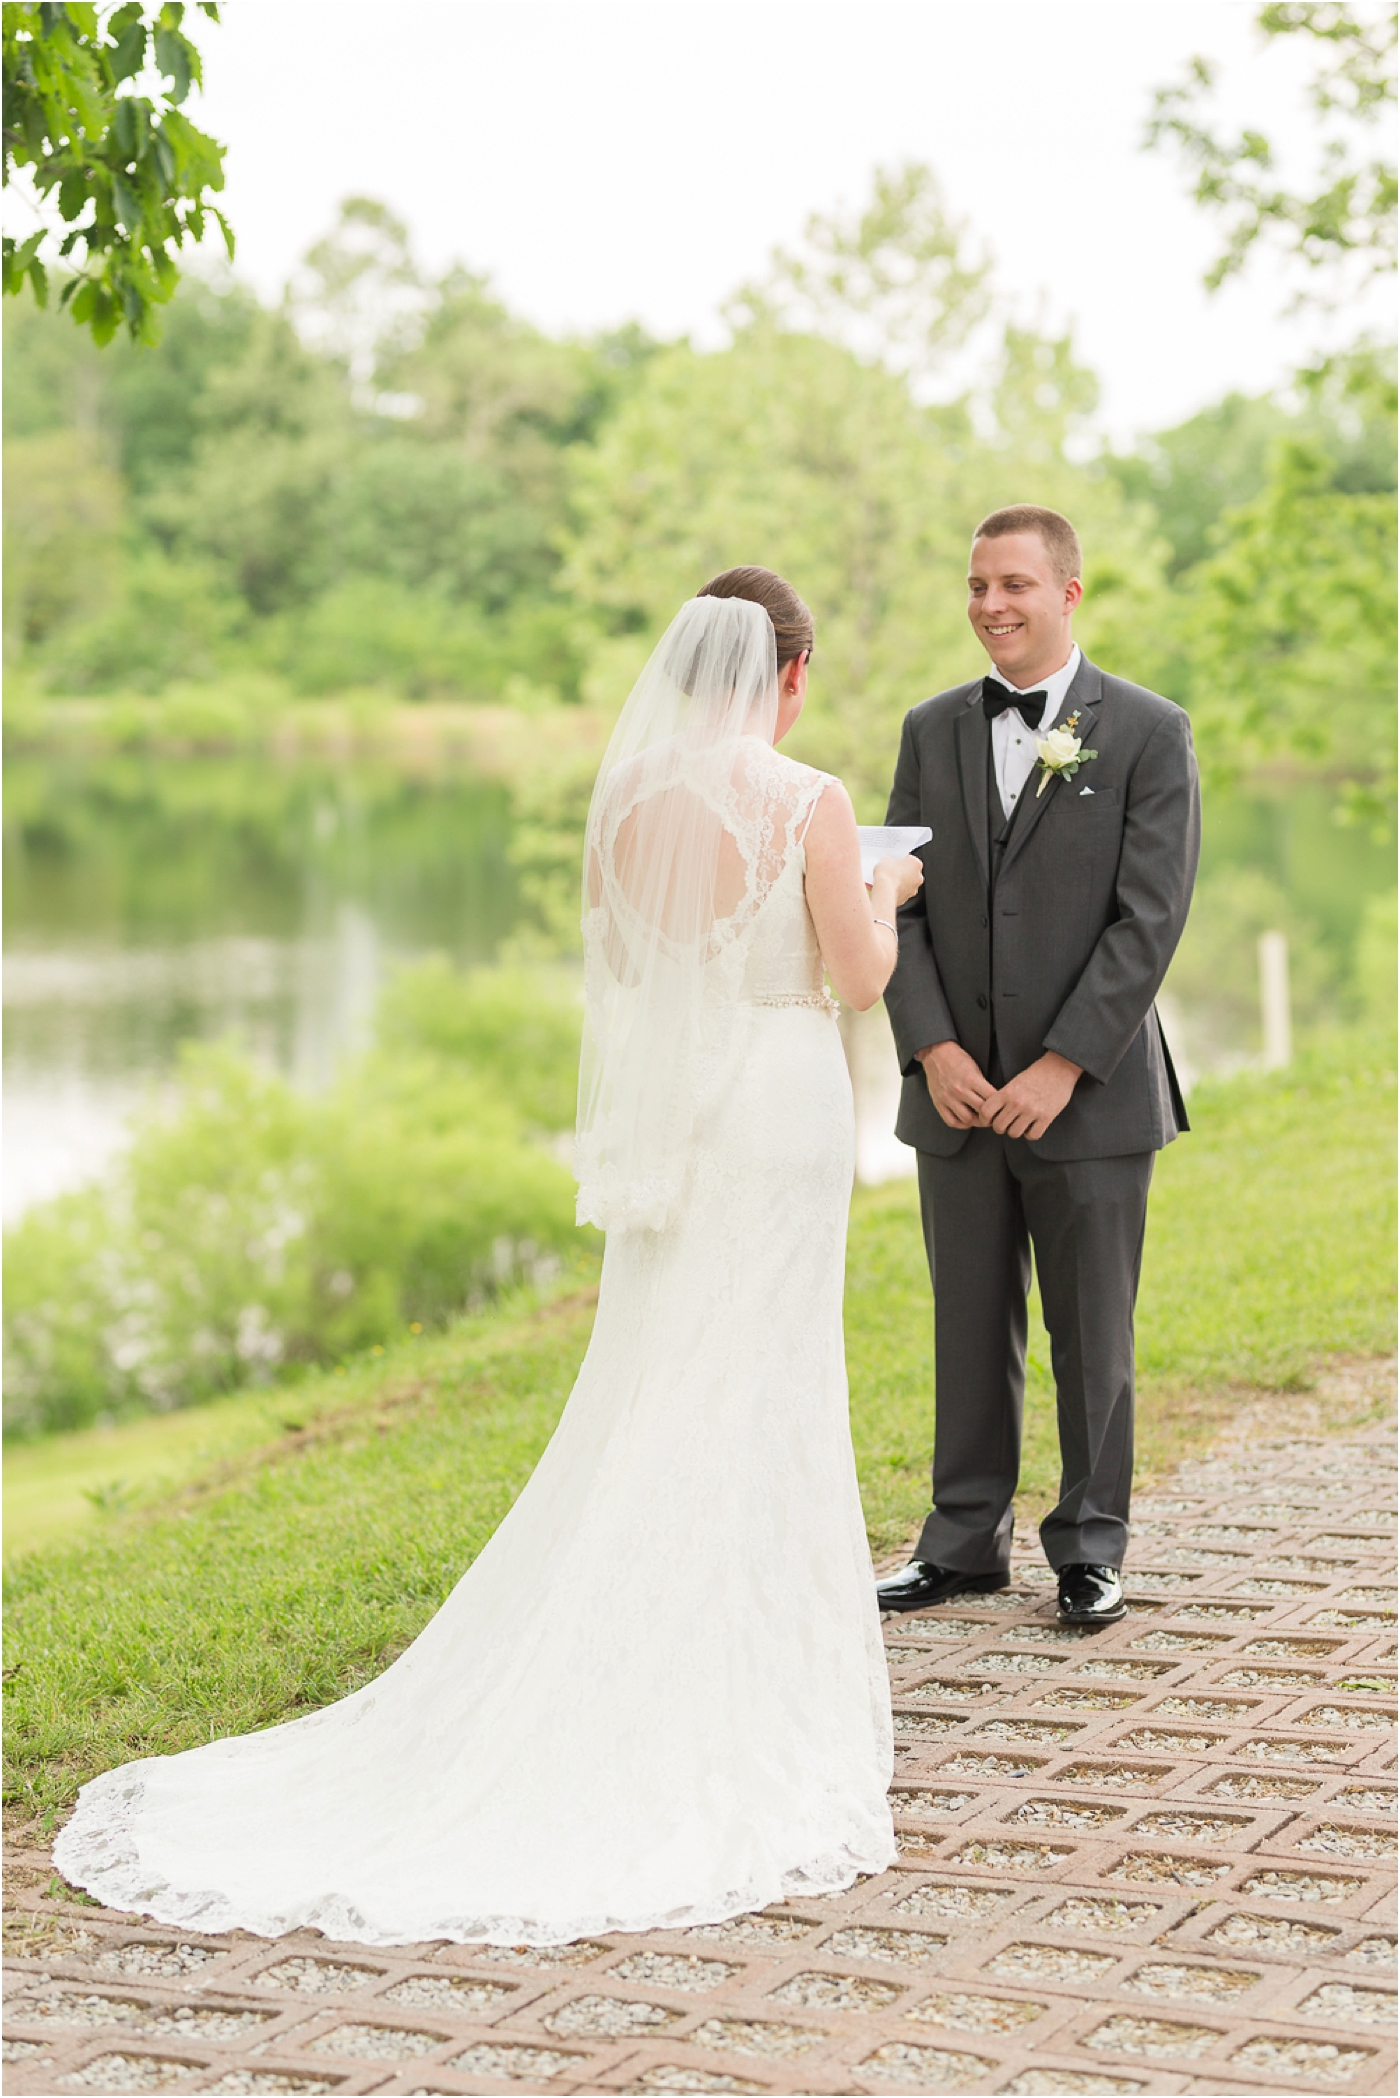 Gettysburg-lodges-wedding-photos-39.jpg